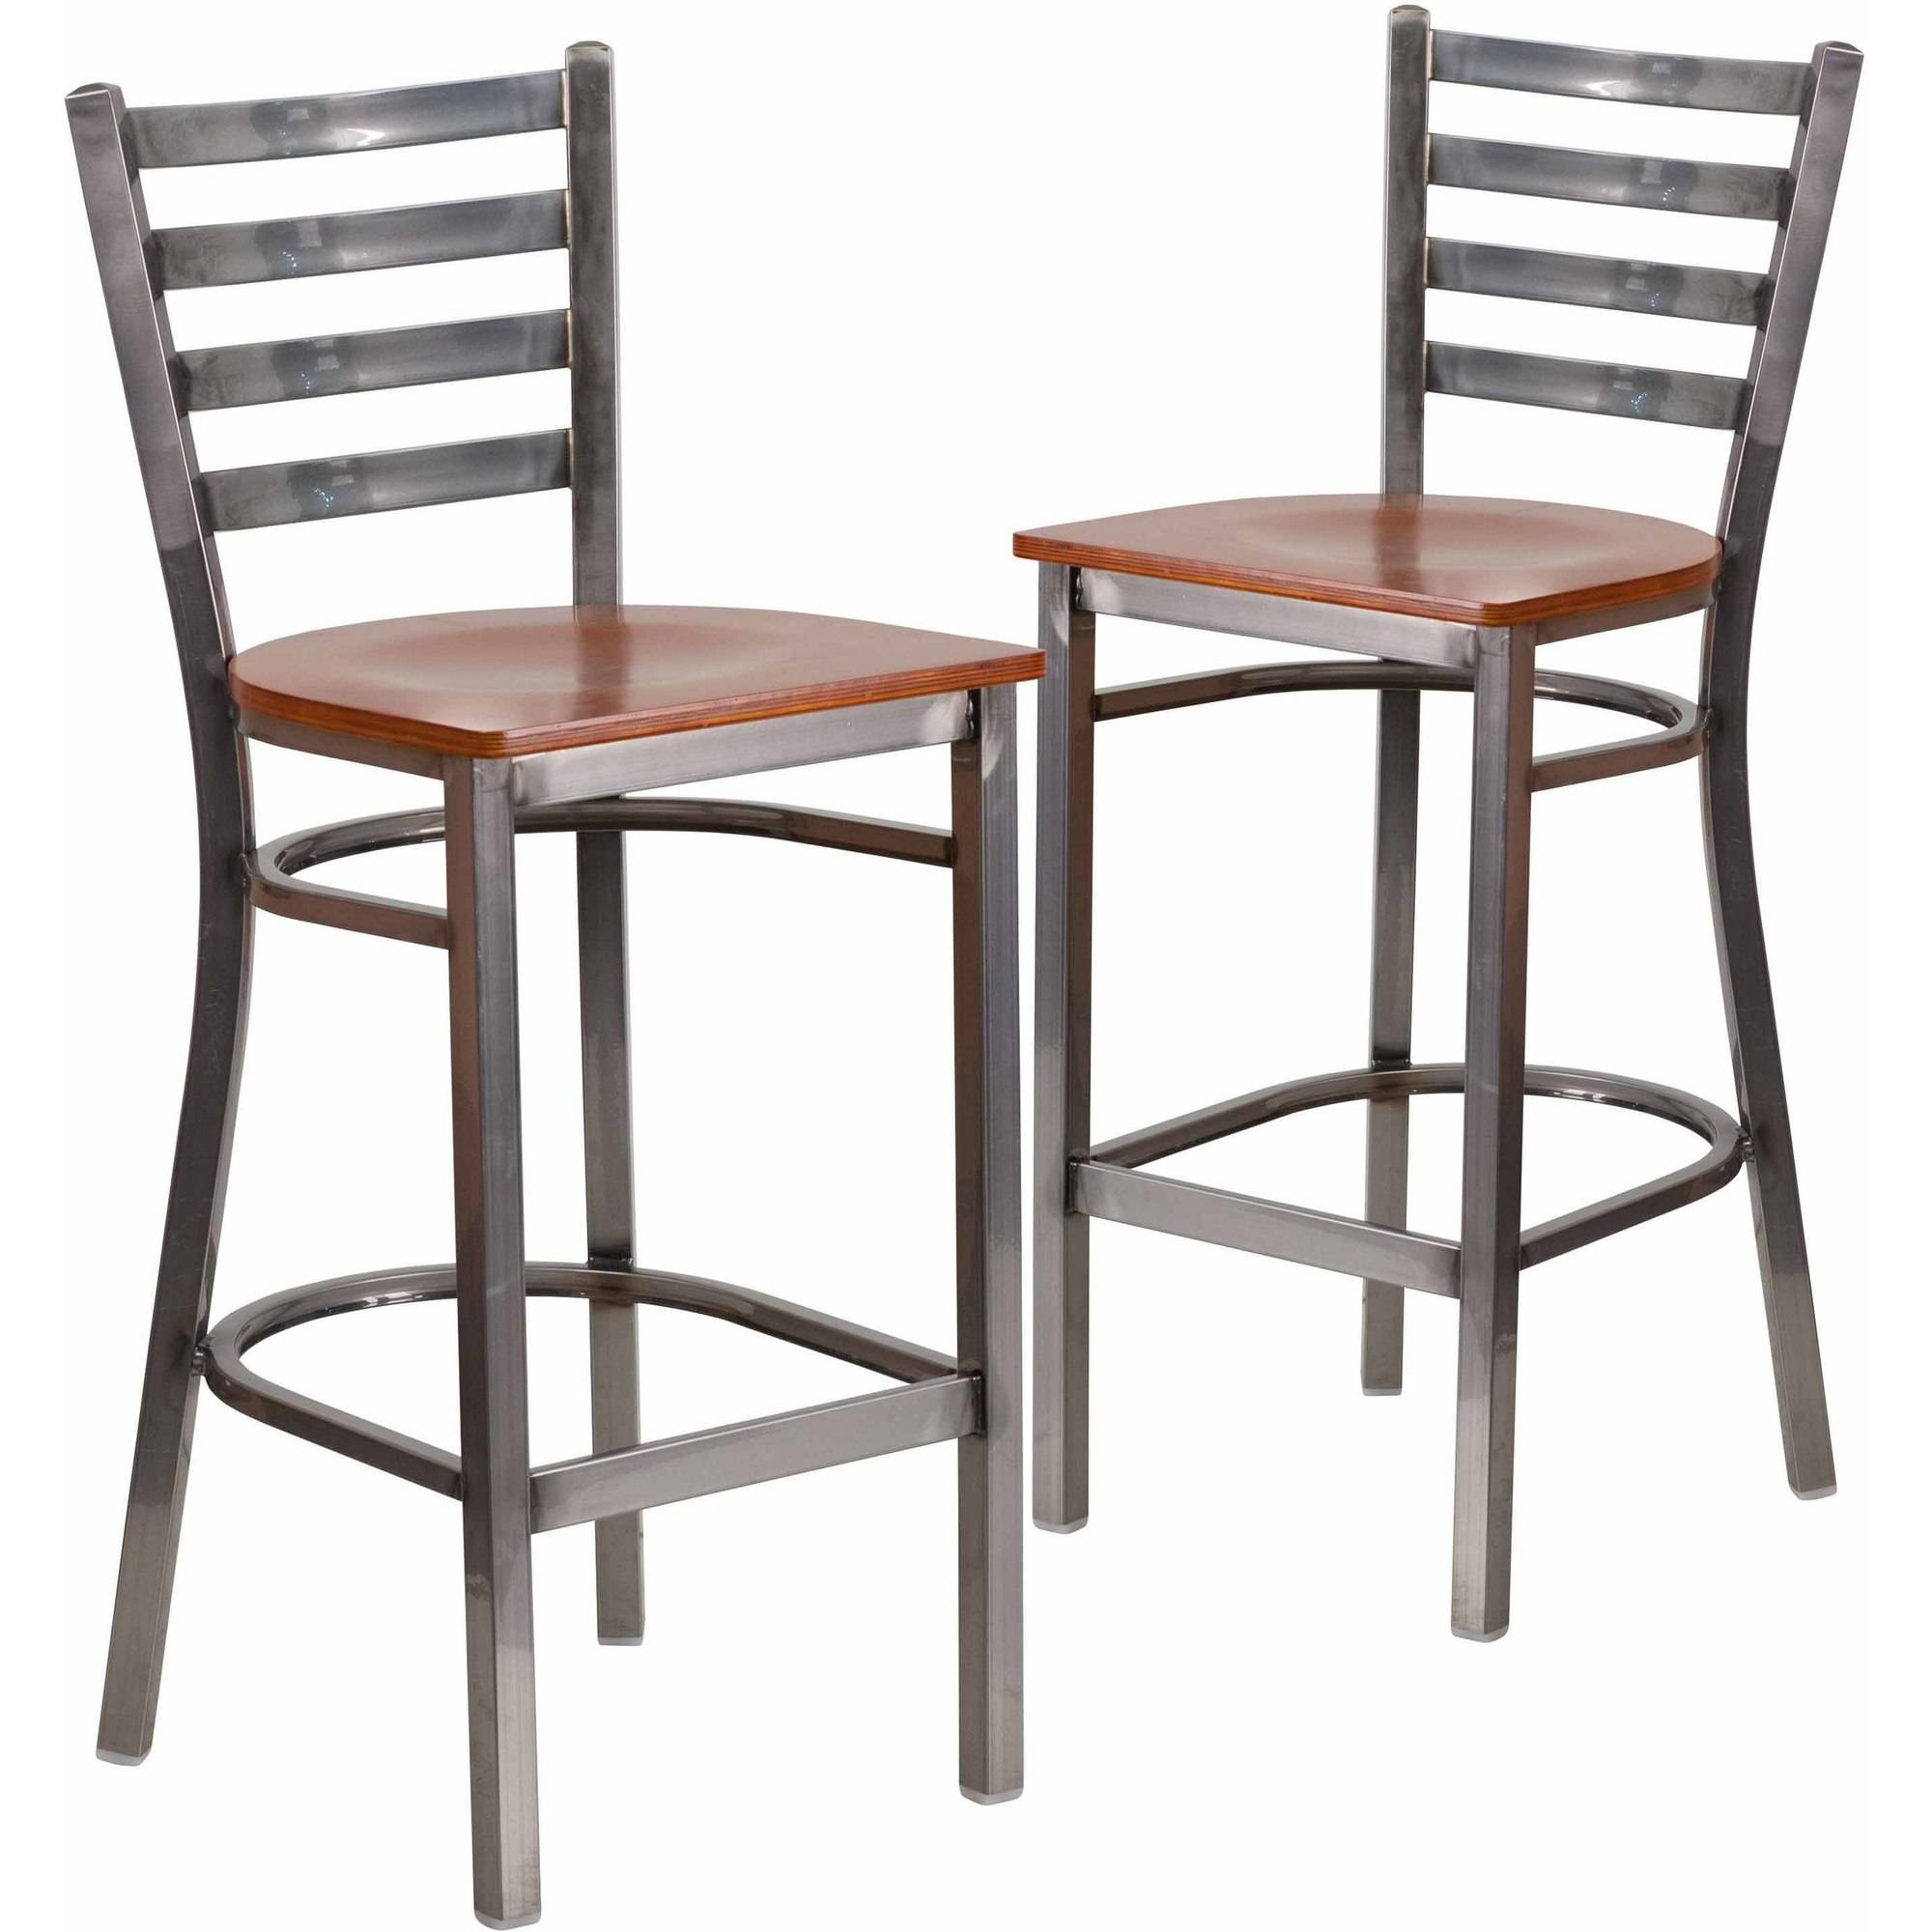 Flash Furniture 2-Pack HERCULES Series Clear Coated Ladder Back Metal Restaurant Barstool, Wood Seat, Multiple Colors